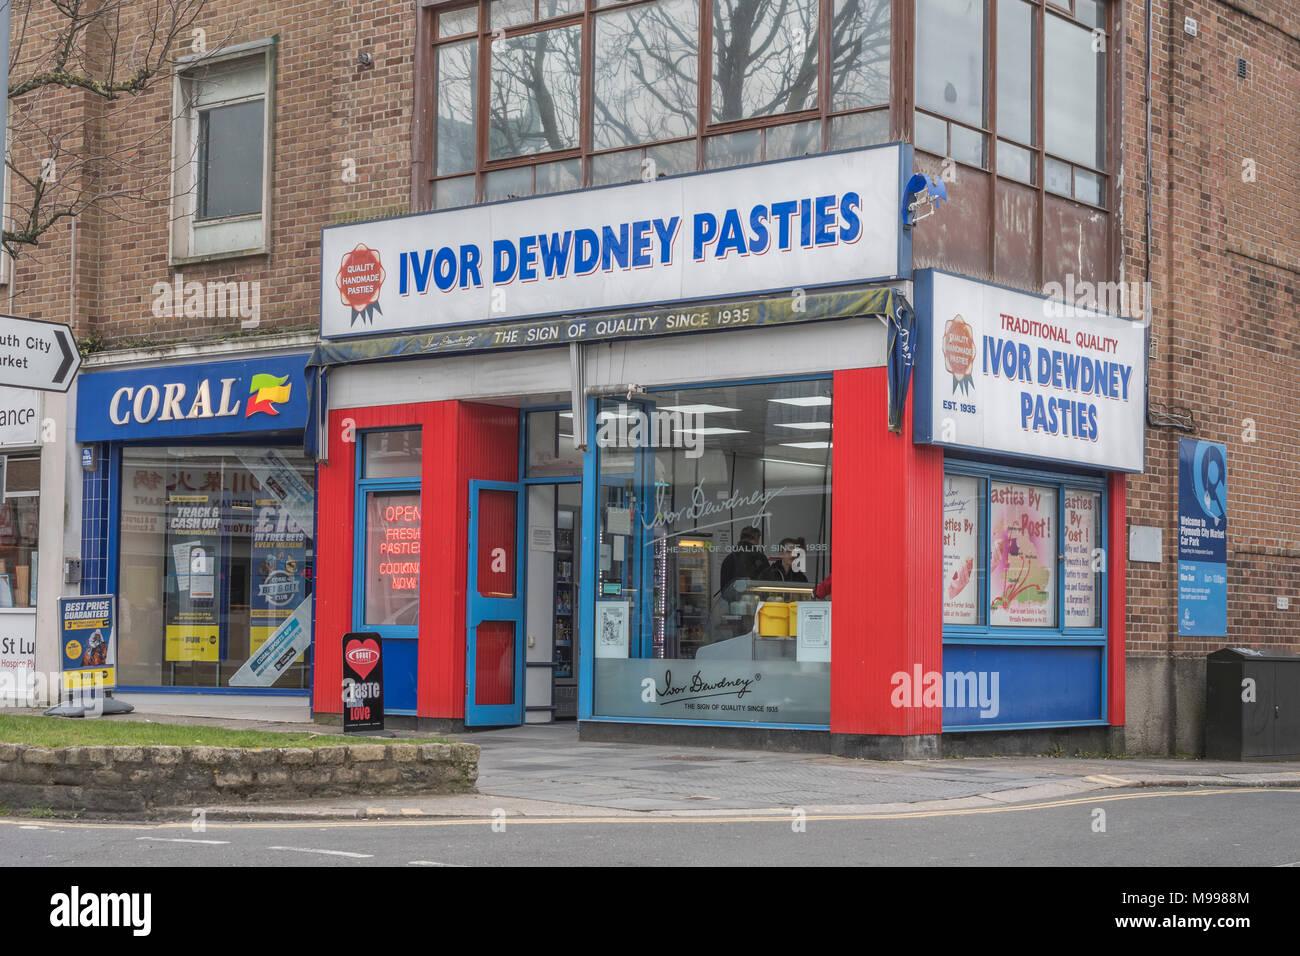 Ivor Dewdney pasty shop in Plymouth, Devon. - Stock Image